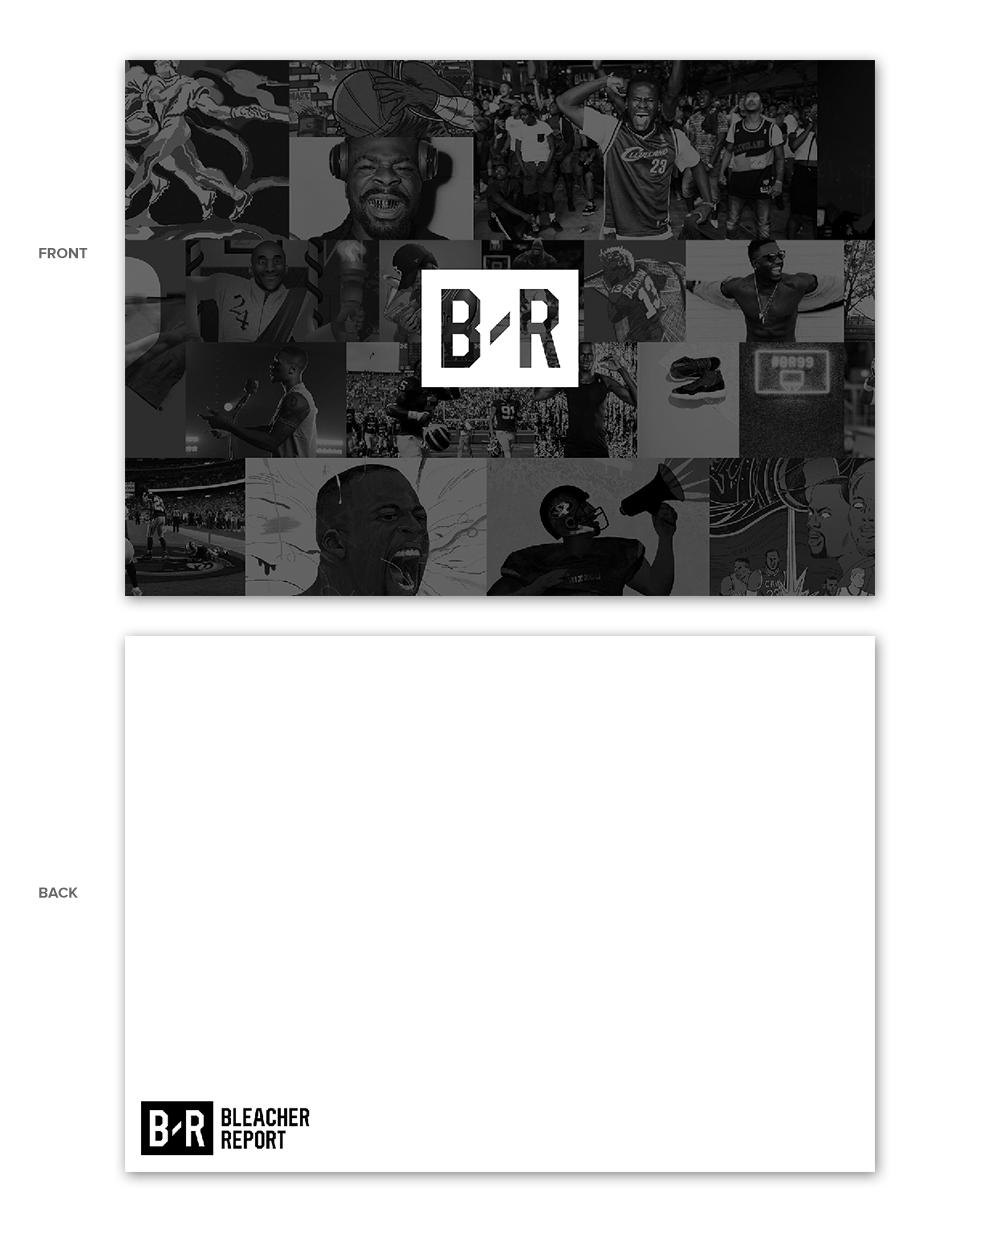 5x7_BR_rebrand_visual_0809.jpg